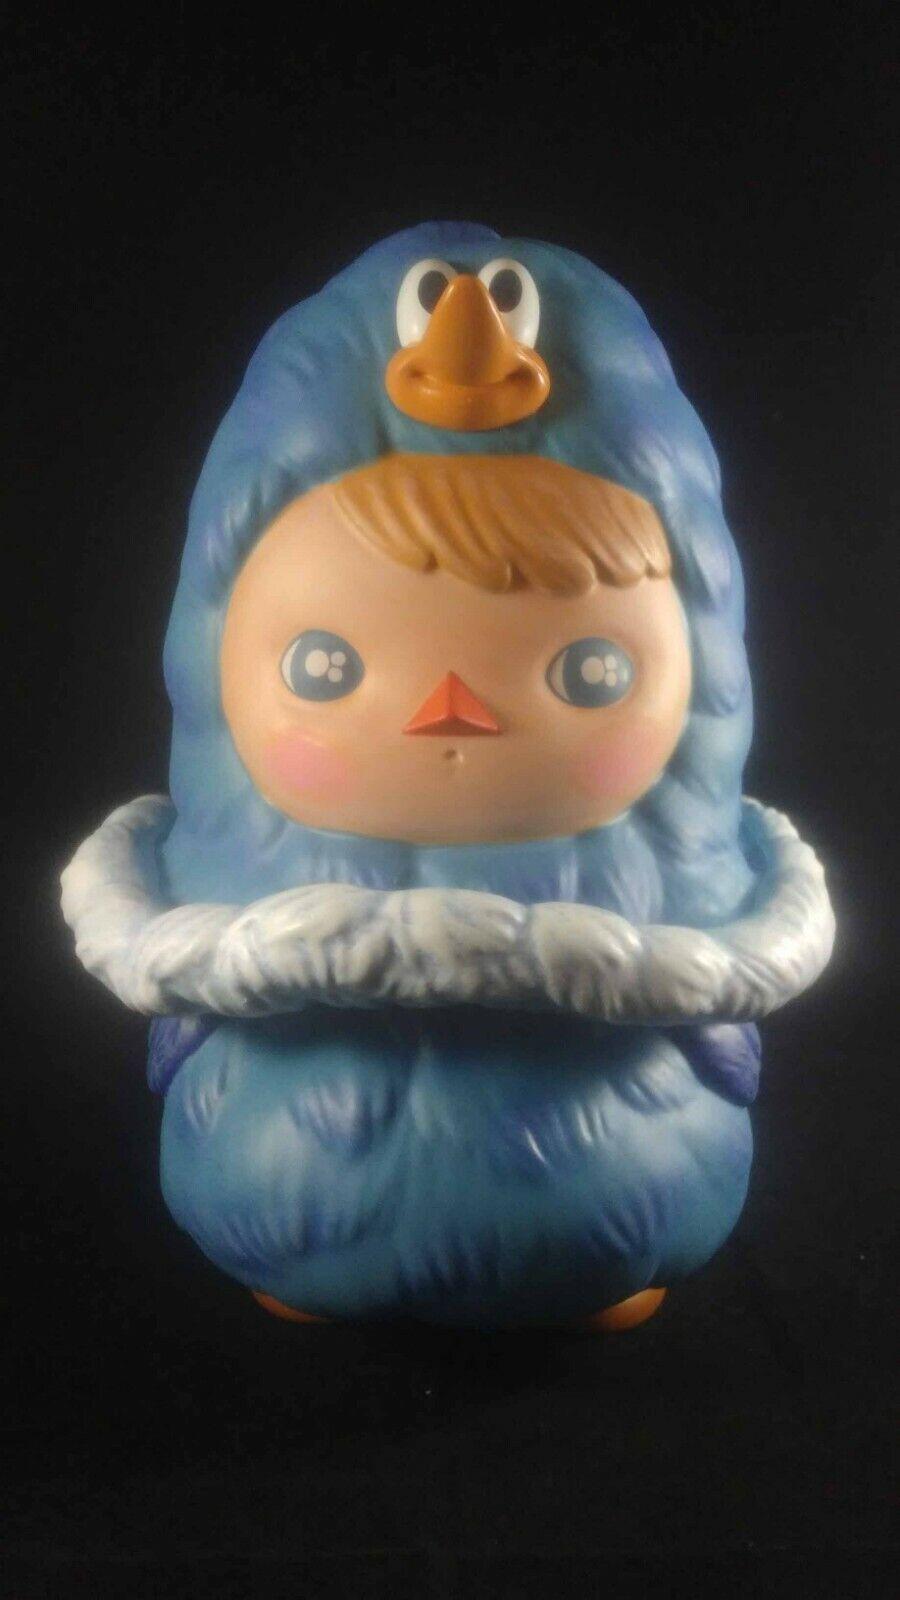 SpielzeugQube Soap Studio WB Get Animated Pucky Road laufenner 8  Vinyl Figure